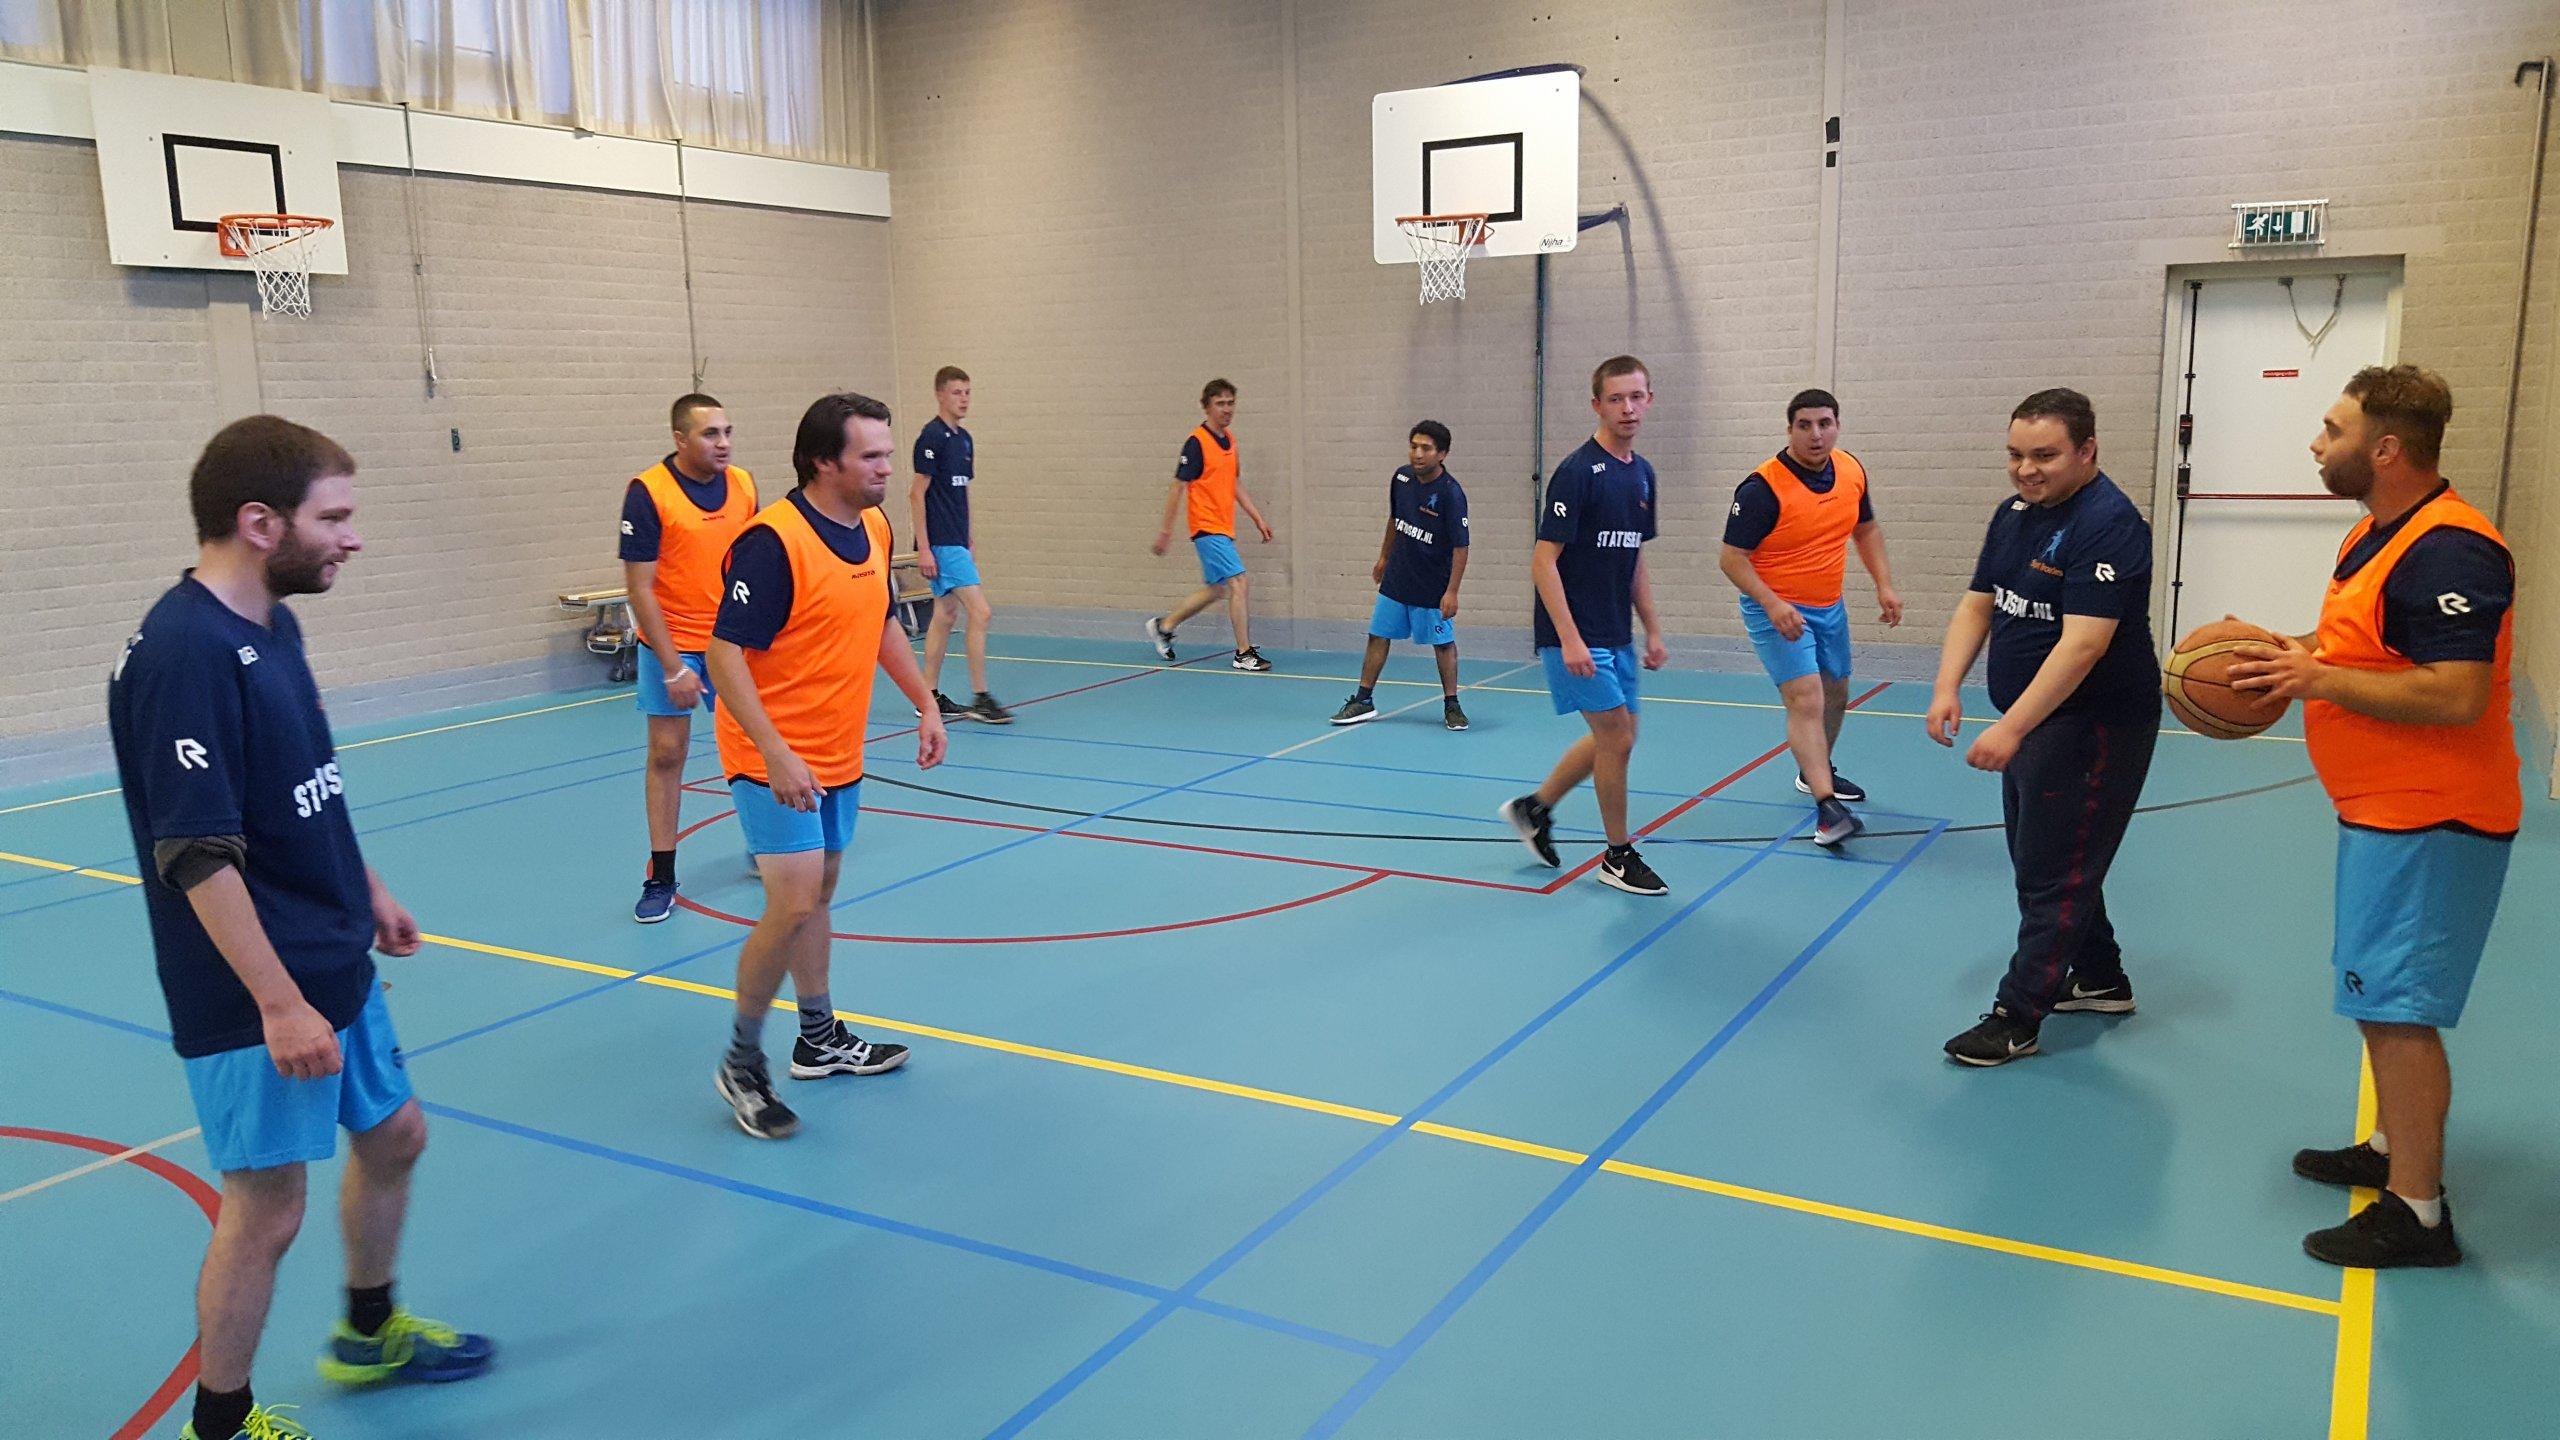 basketbal in de gymzaal